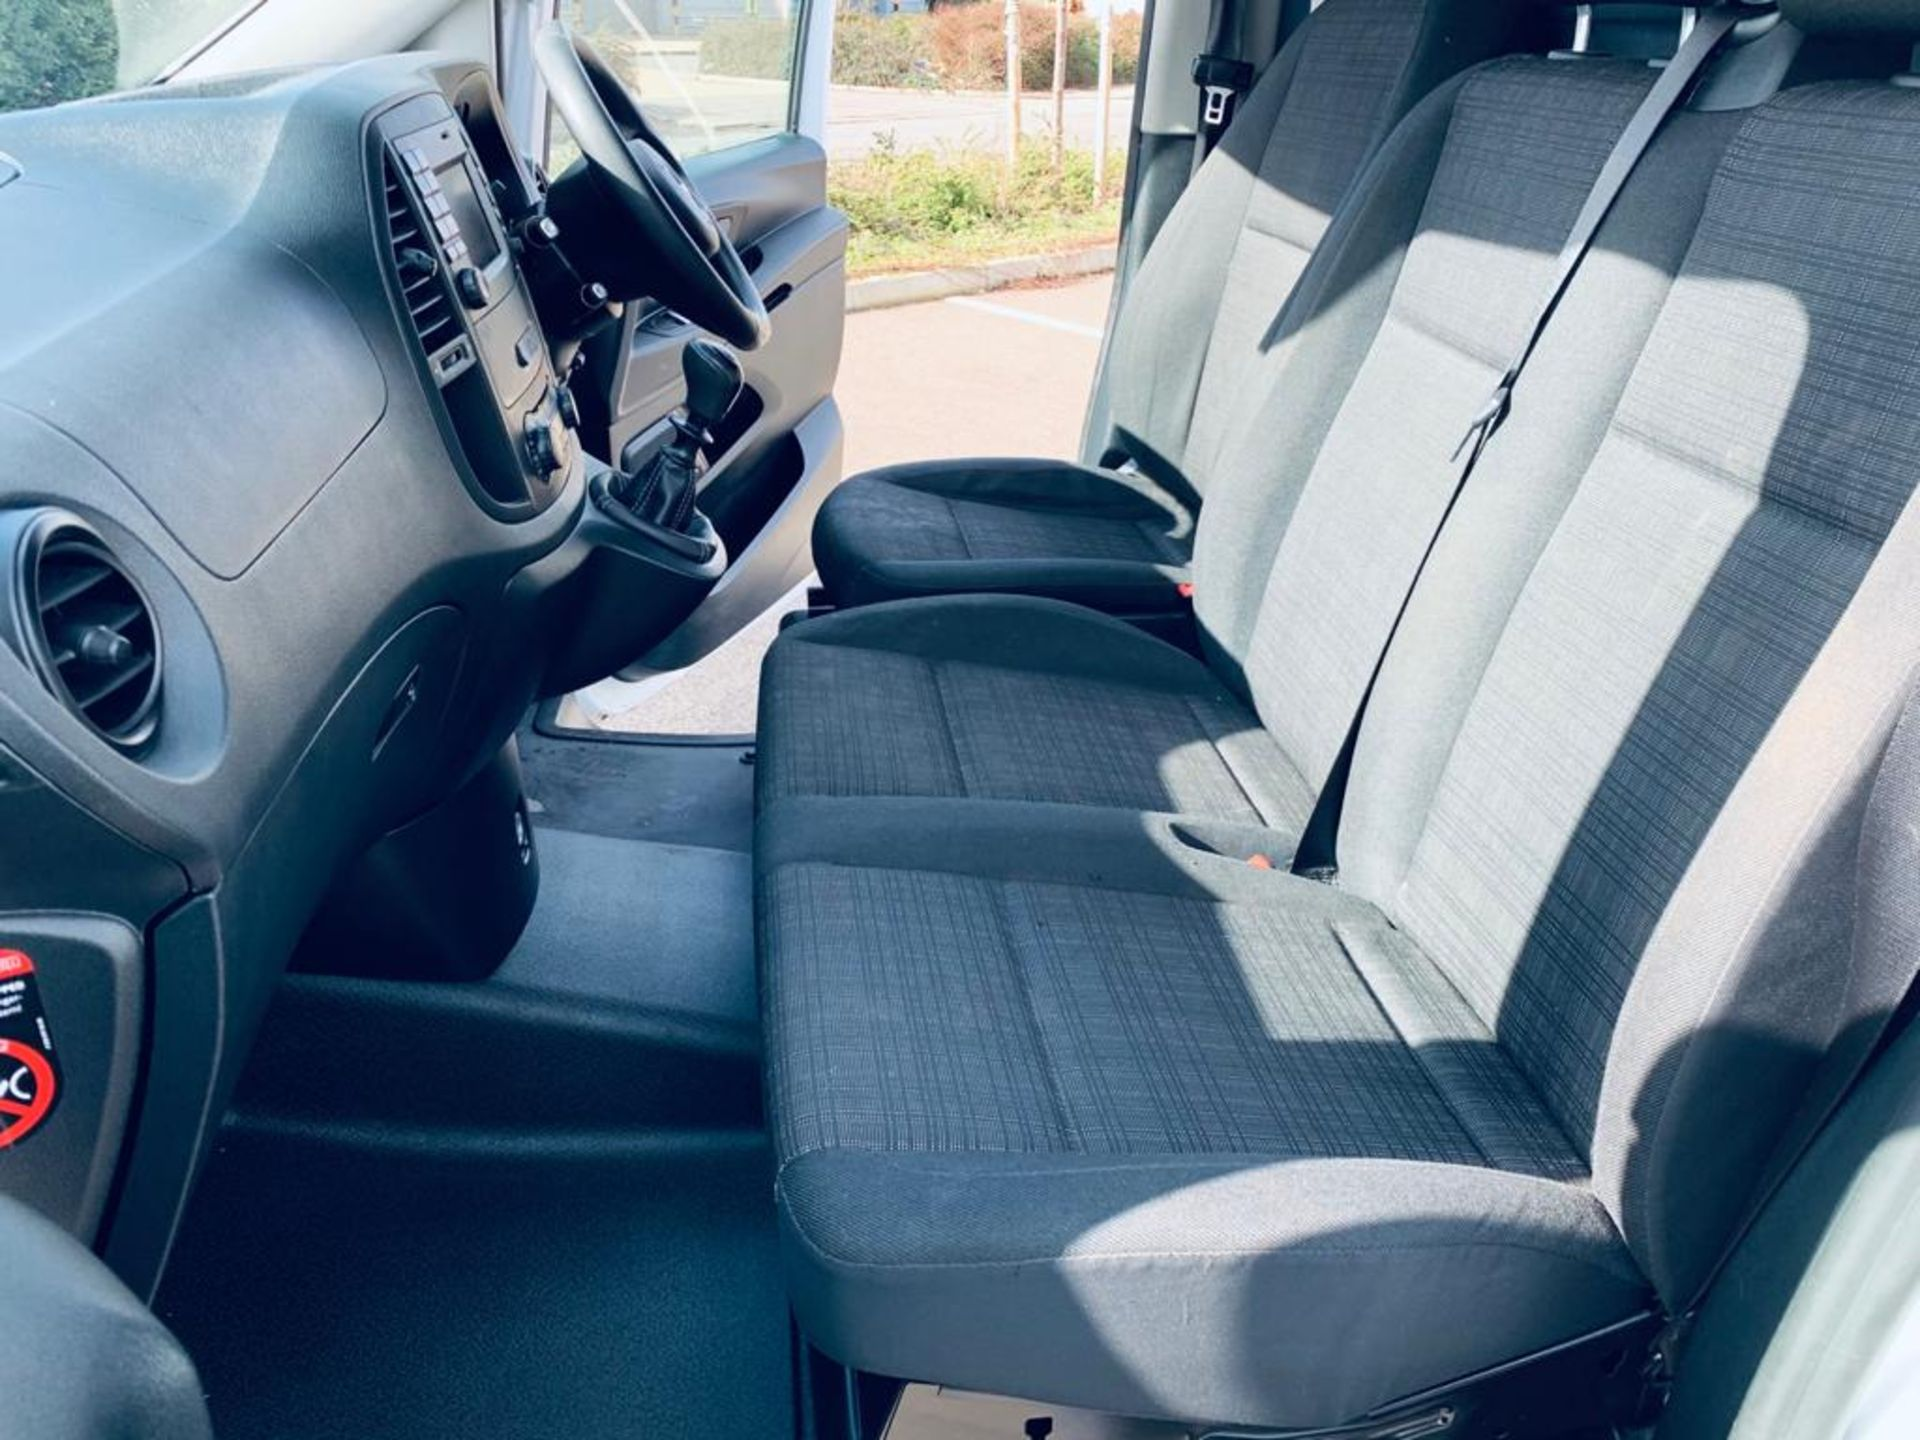 Reserve Met - Mercedes Vito 114CDI Bluetec 2018 18 Reg LWB - Air Con - Euro 6 - FSH - ULEZ - 1 Owner - Image 16 of 26